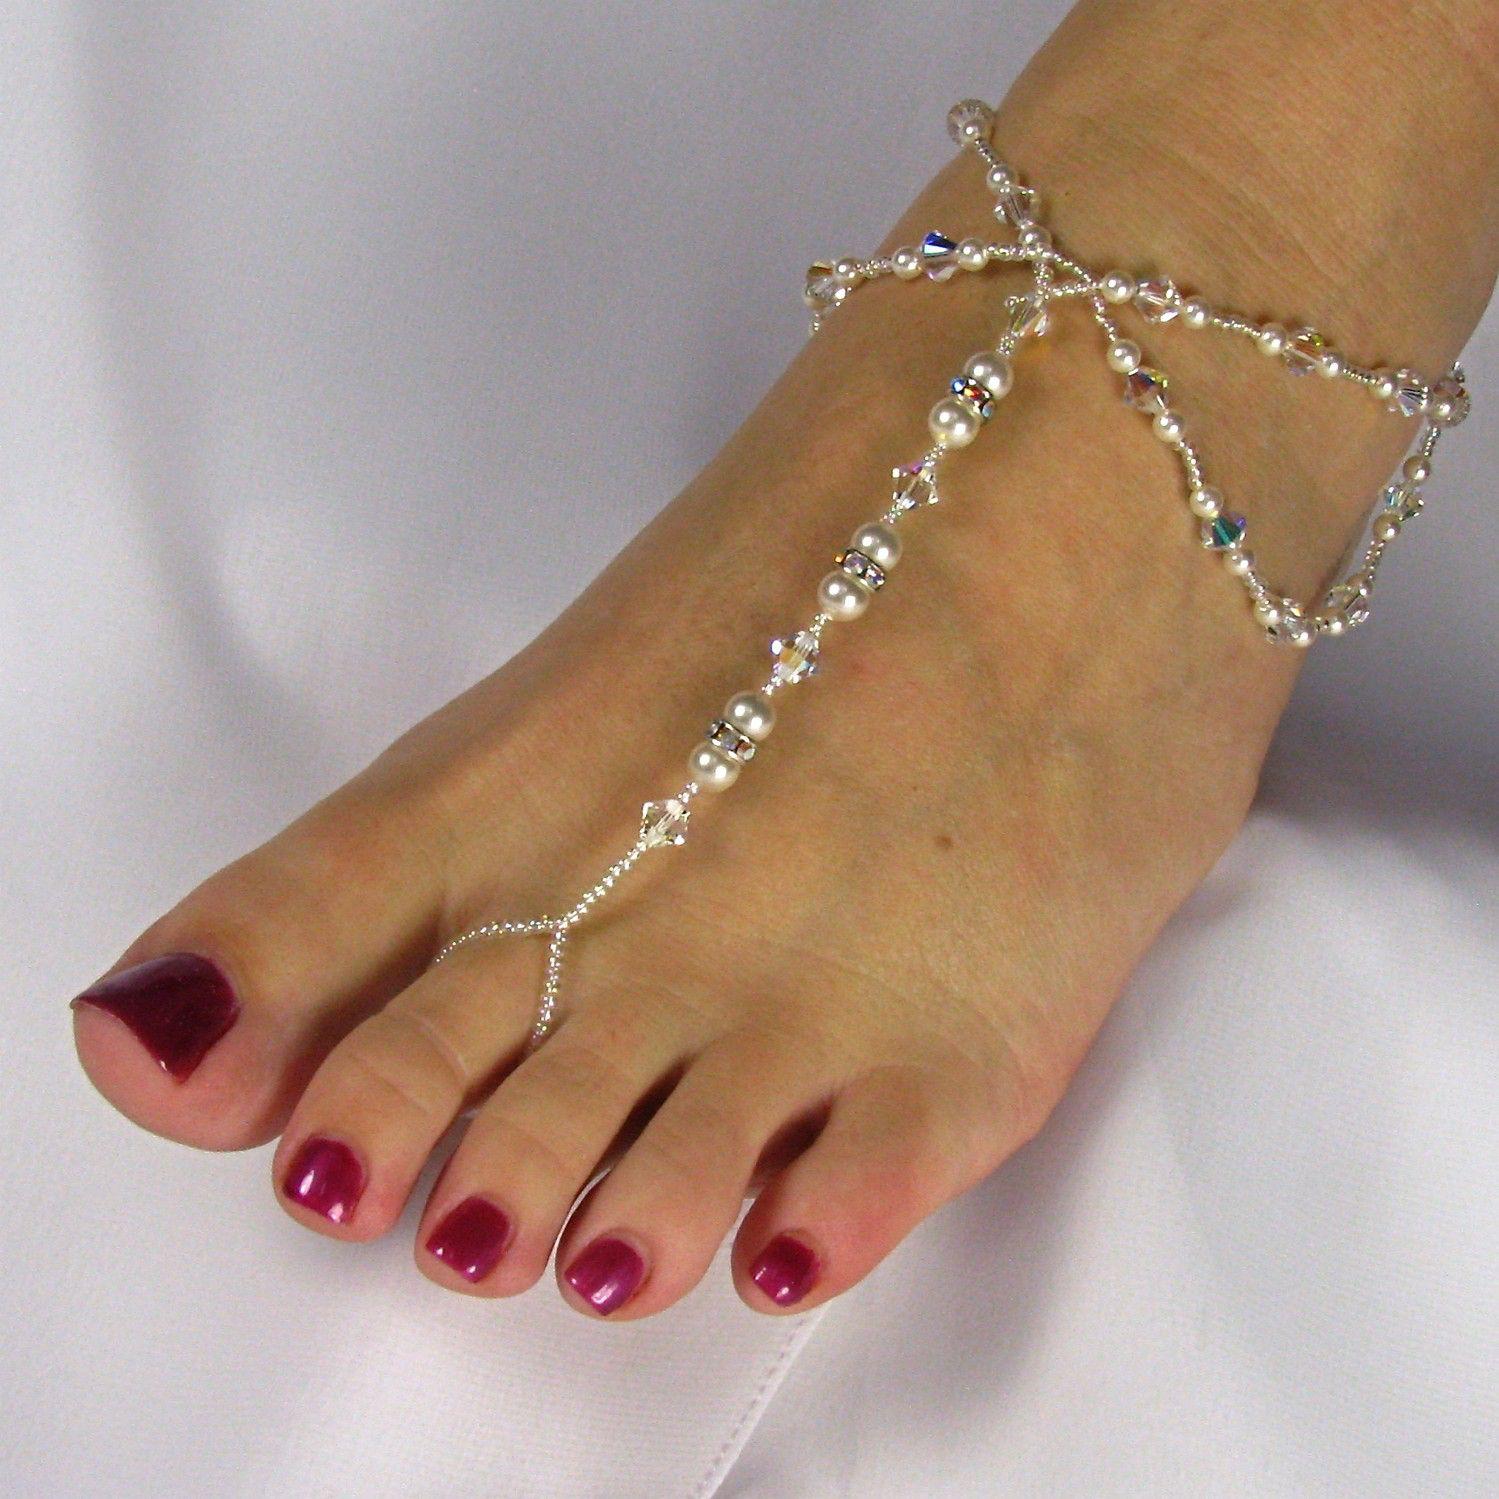 cd33c87b45e Barefoot Sandals Beach Wedding Sandal Bridal Foot Jewelry Bridal Sandal  Swarovski Crystal Rondell Pearl Design 5 by TwoBeWedJewelry on Etsy ...